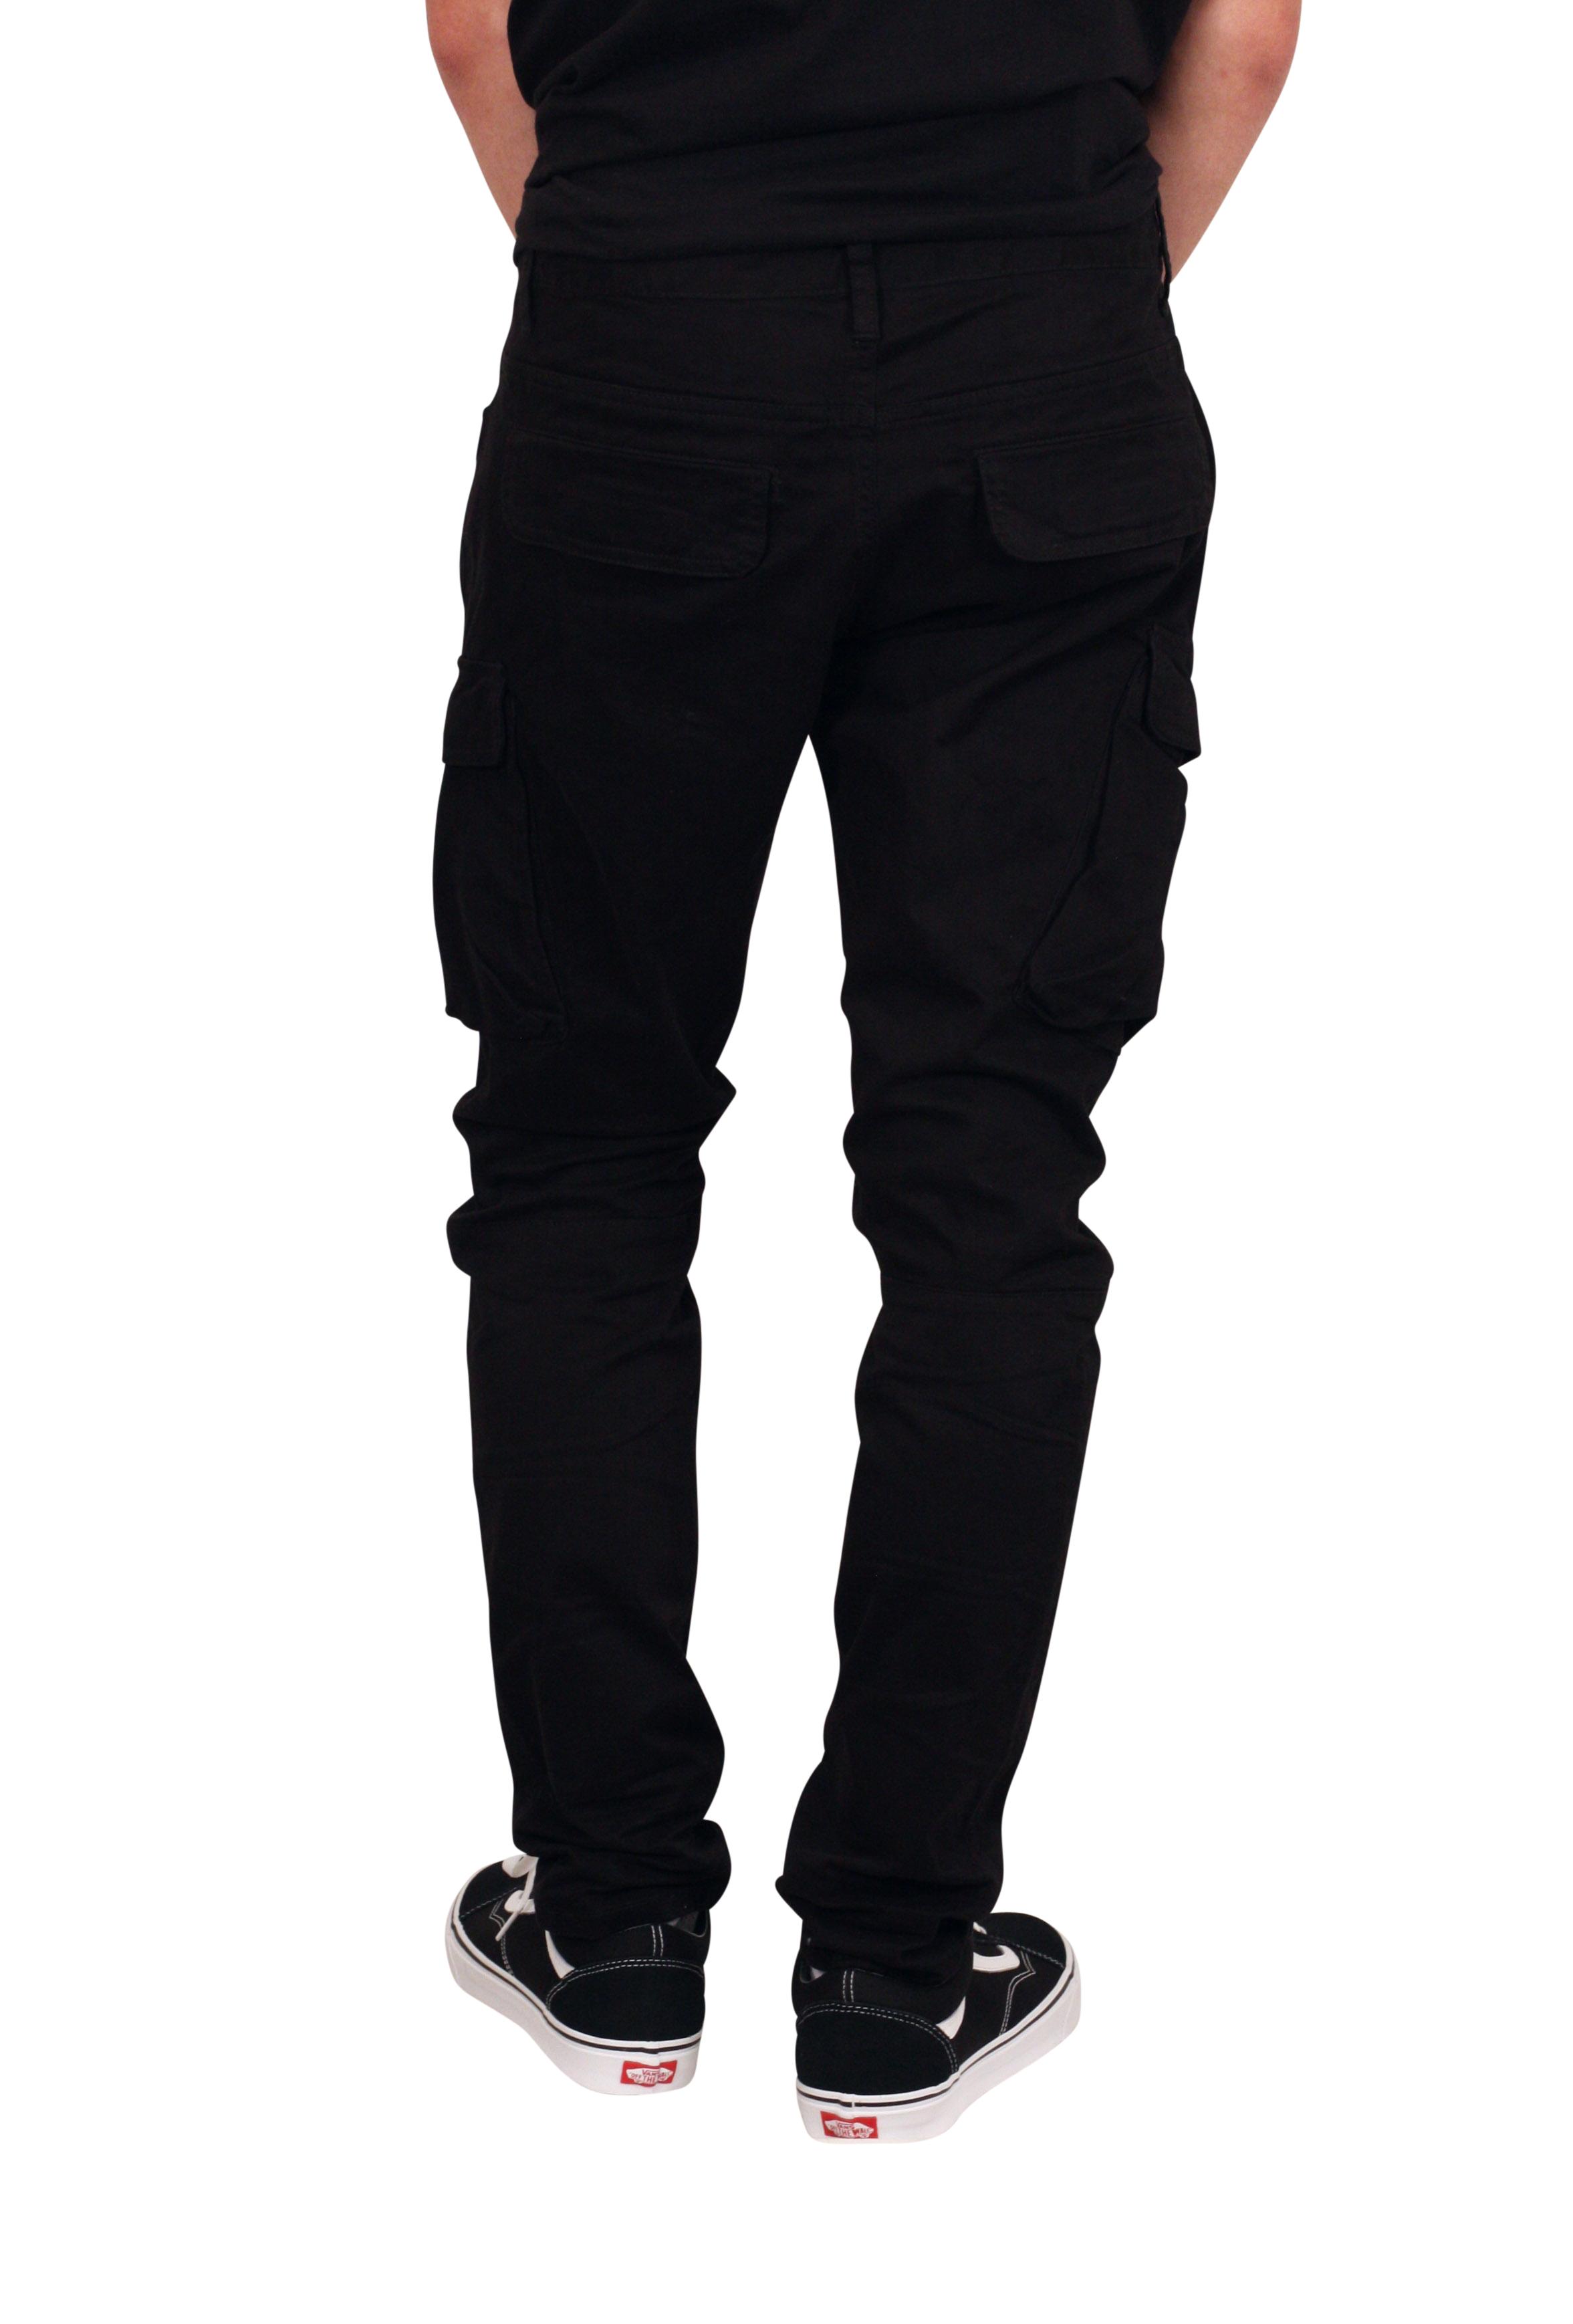 SMOKE RISE Slim Fit Cargo Pants